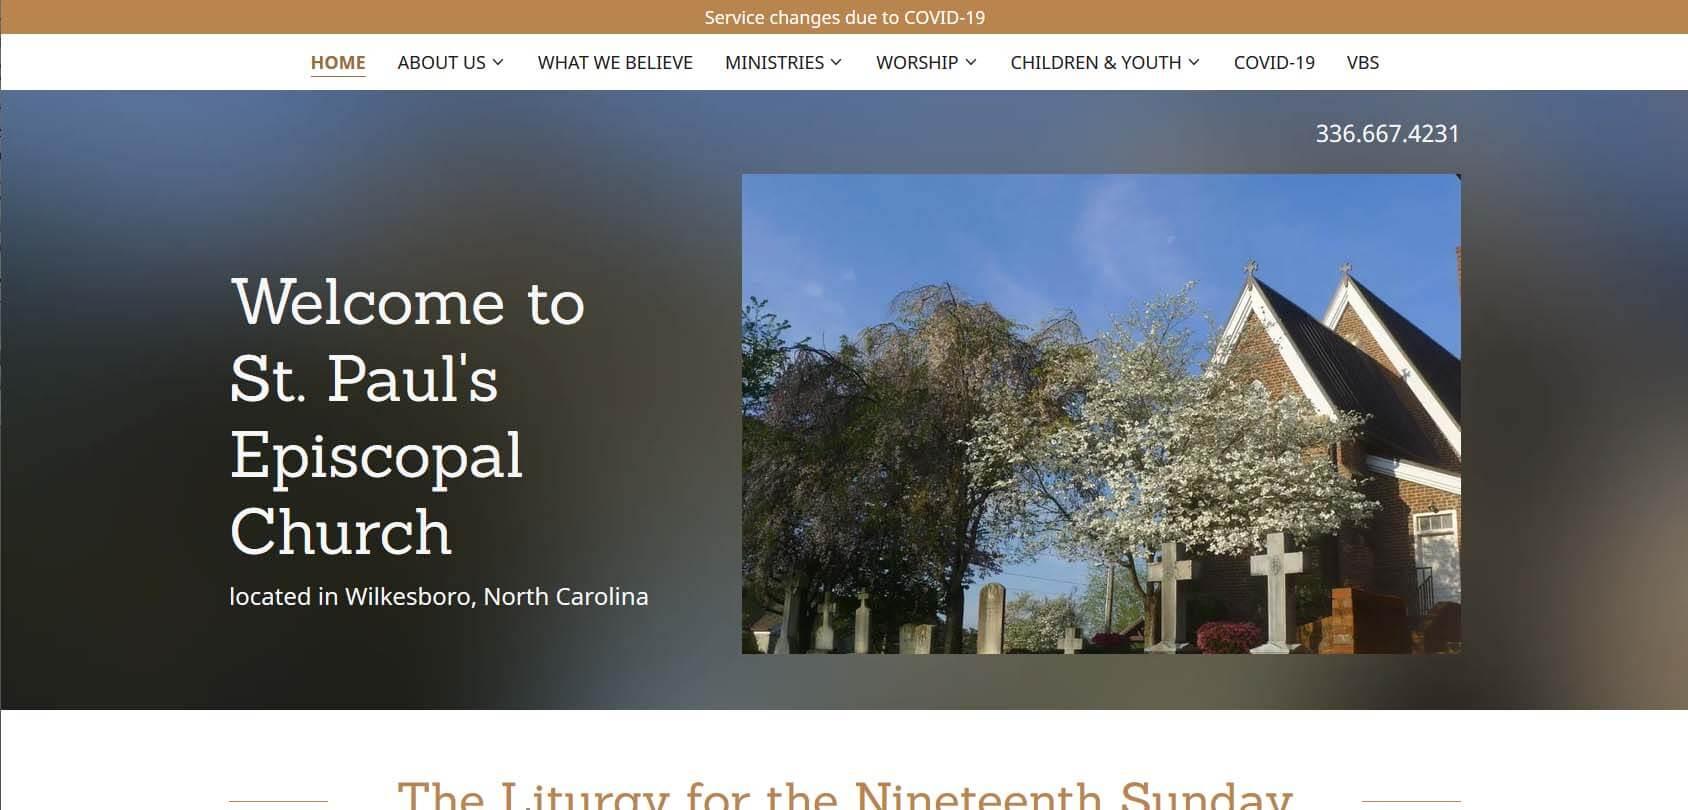 St. Paul's Episcopal Church Homepage